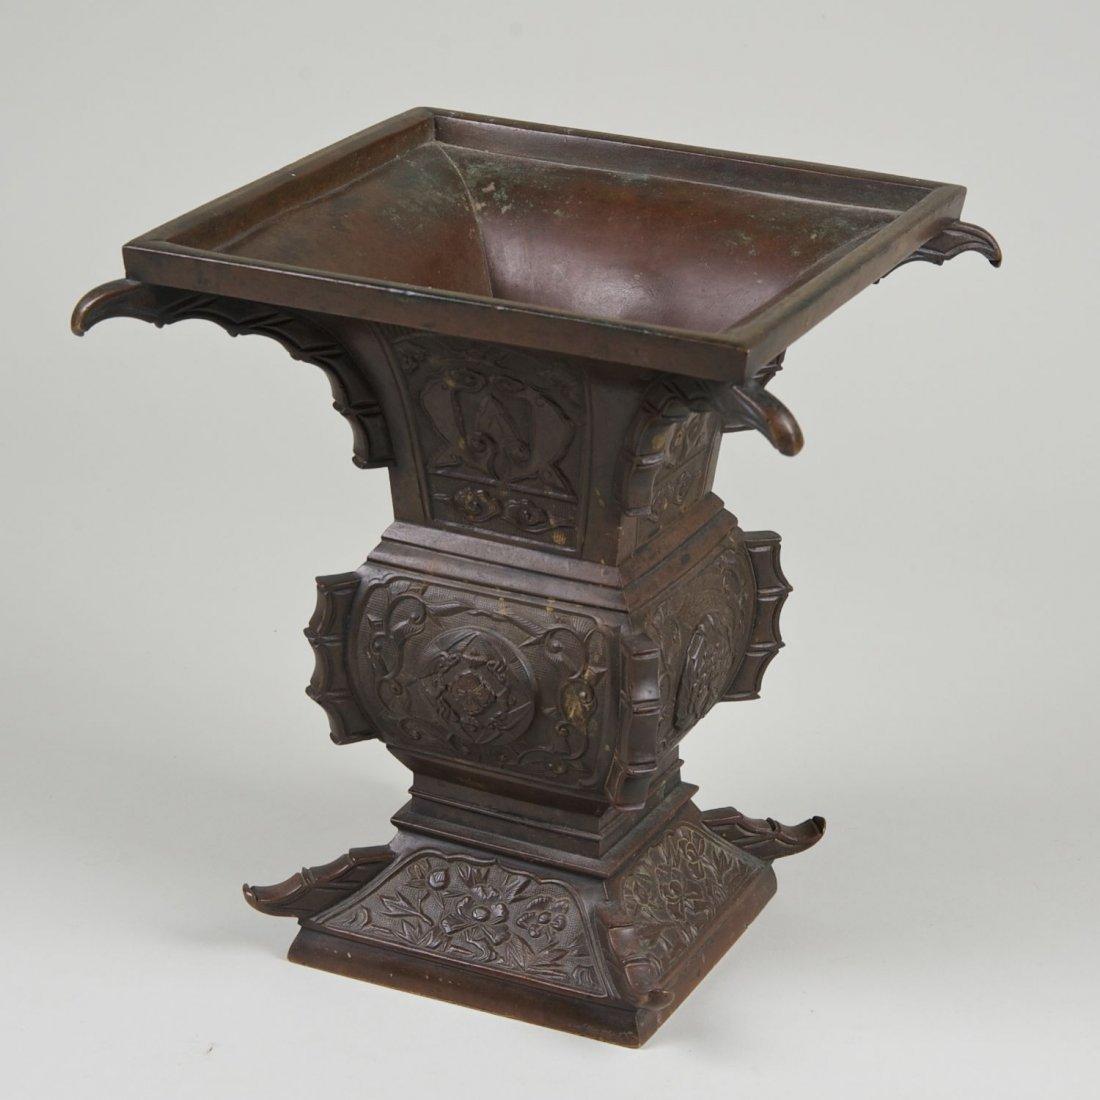 Antique Chinese archaistic bronze vessel